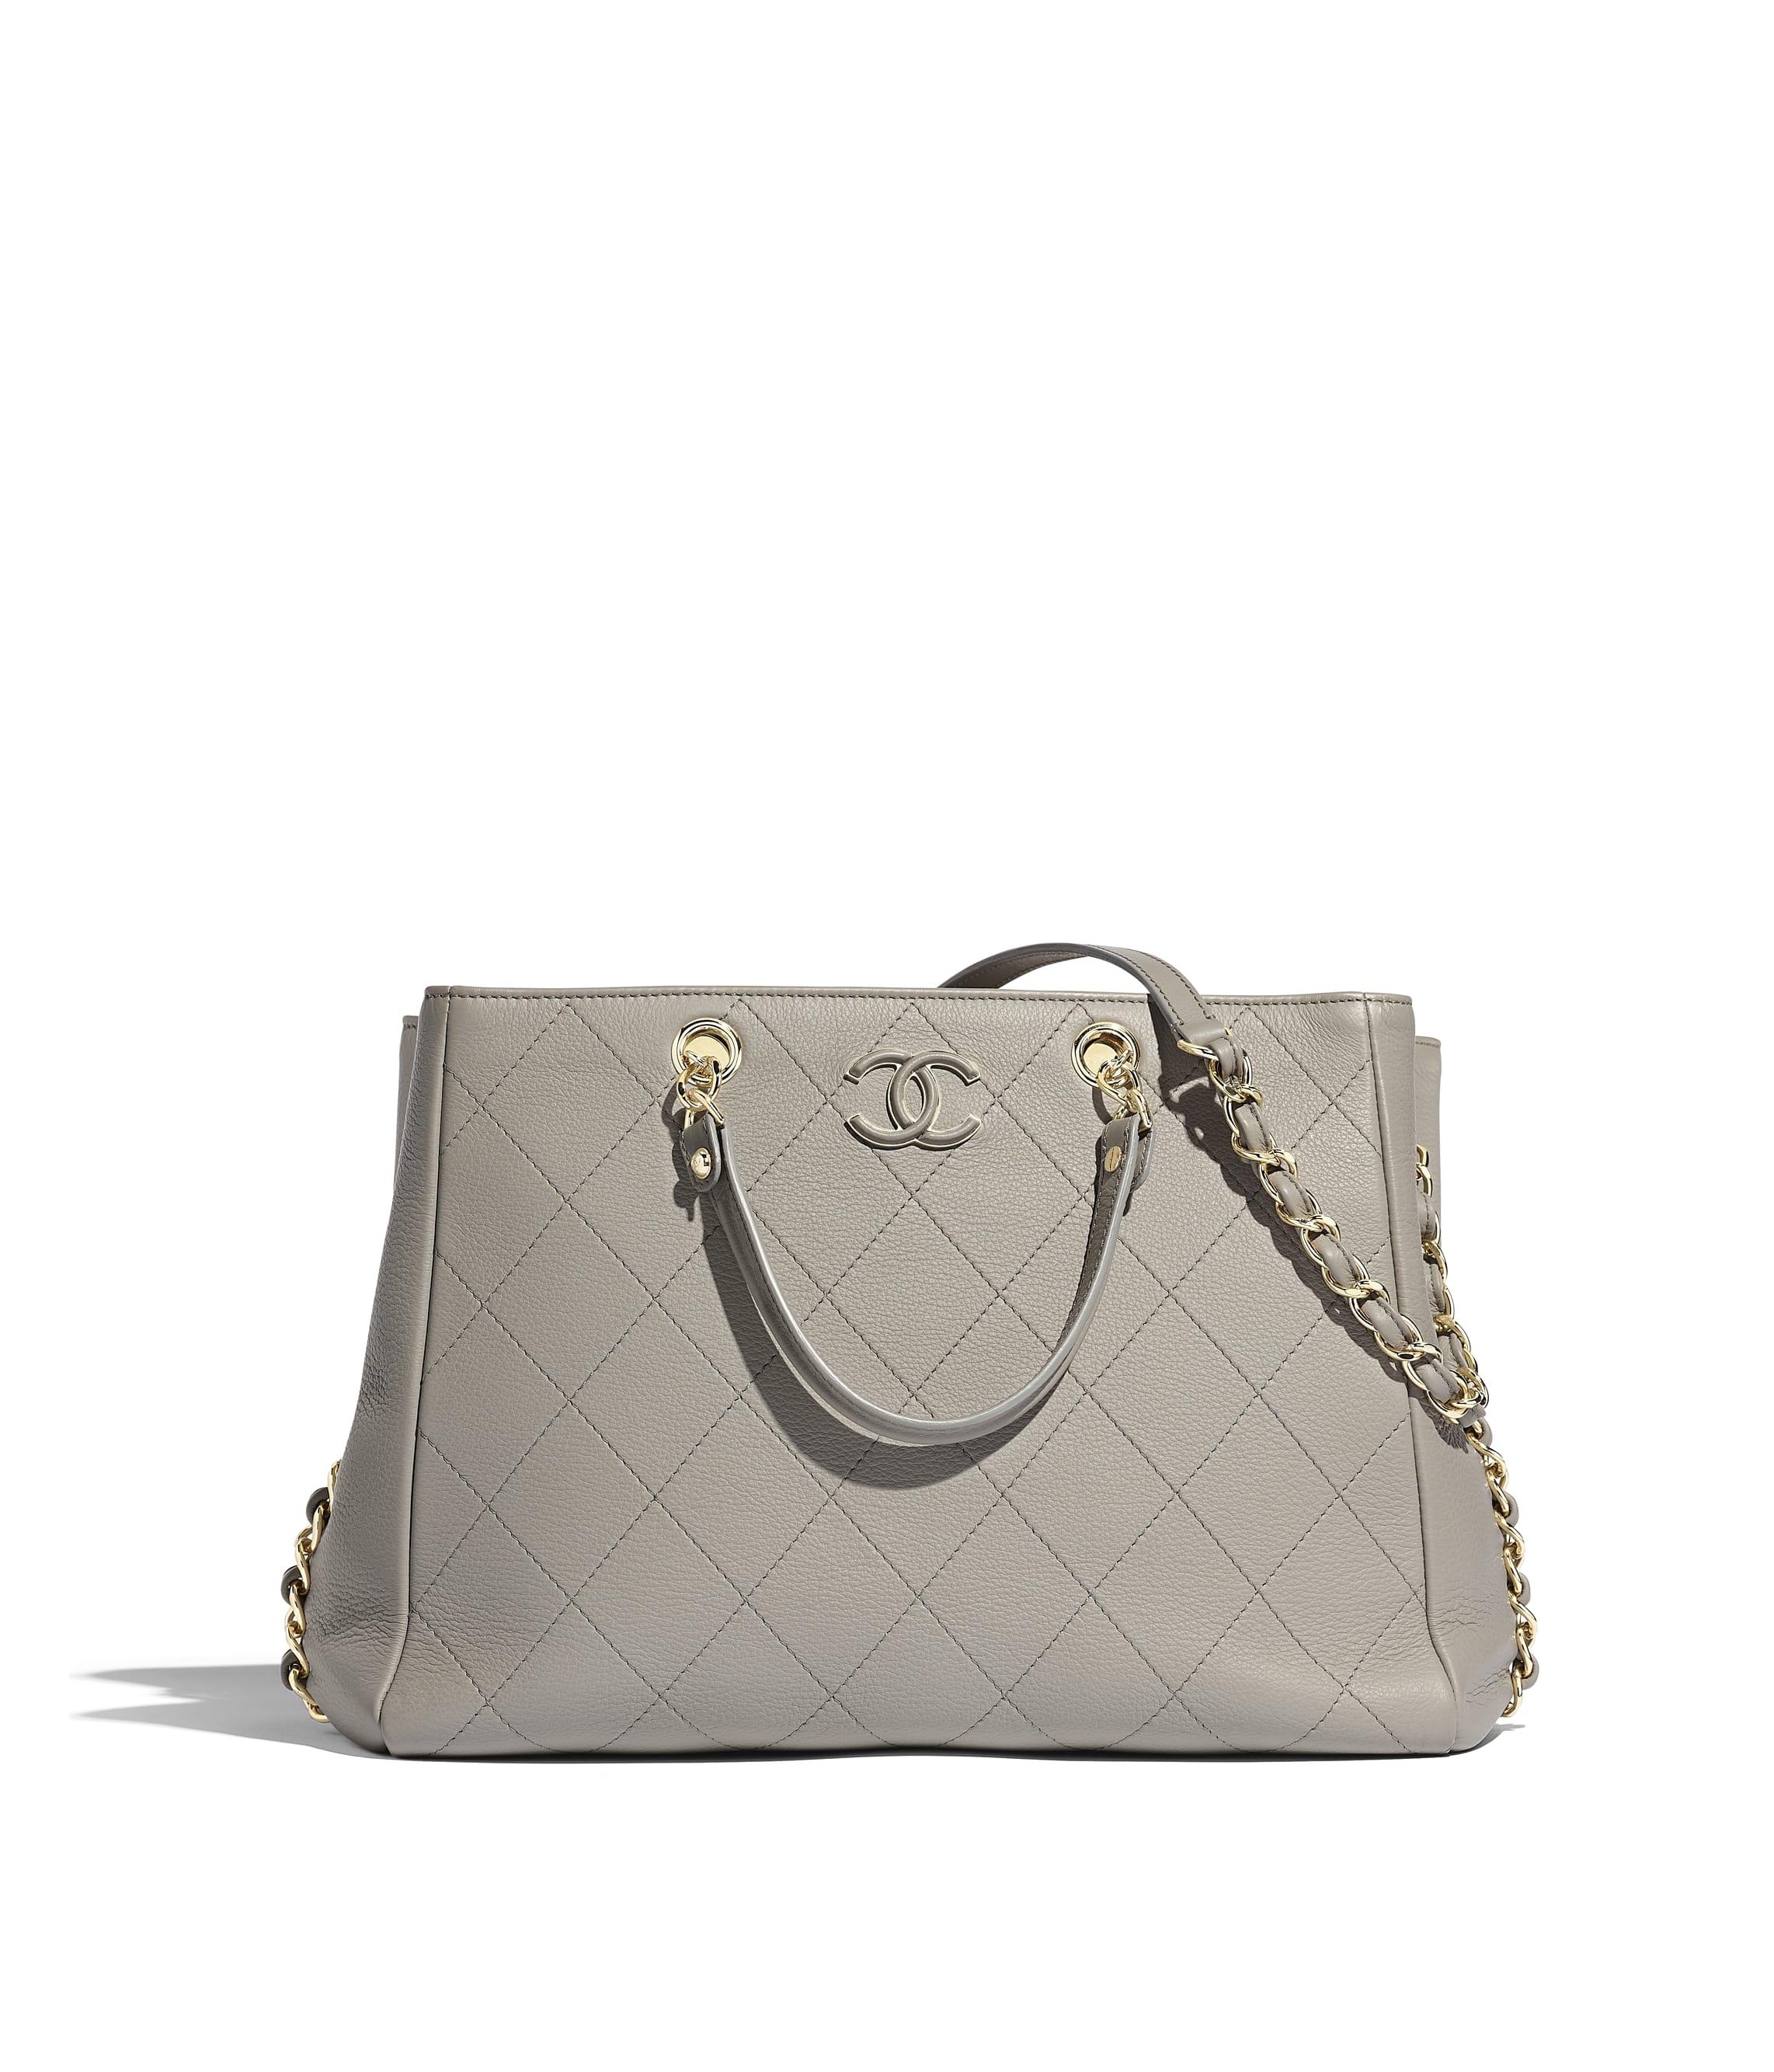 35f902792bde Shopping Bag. Bullskin   Gold-Tone Metal